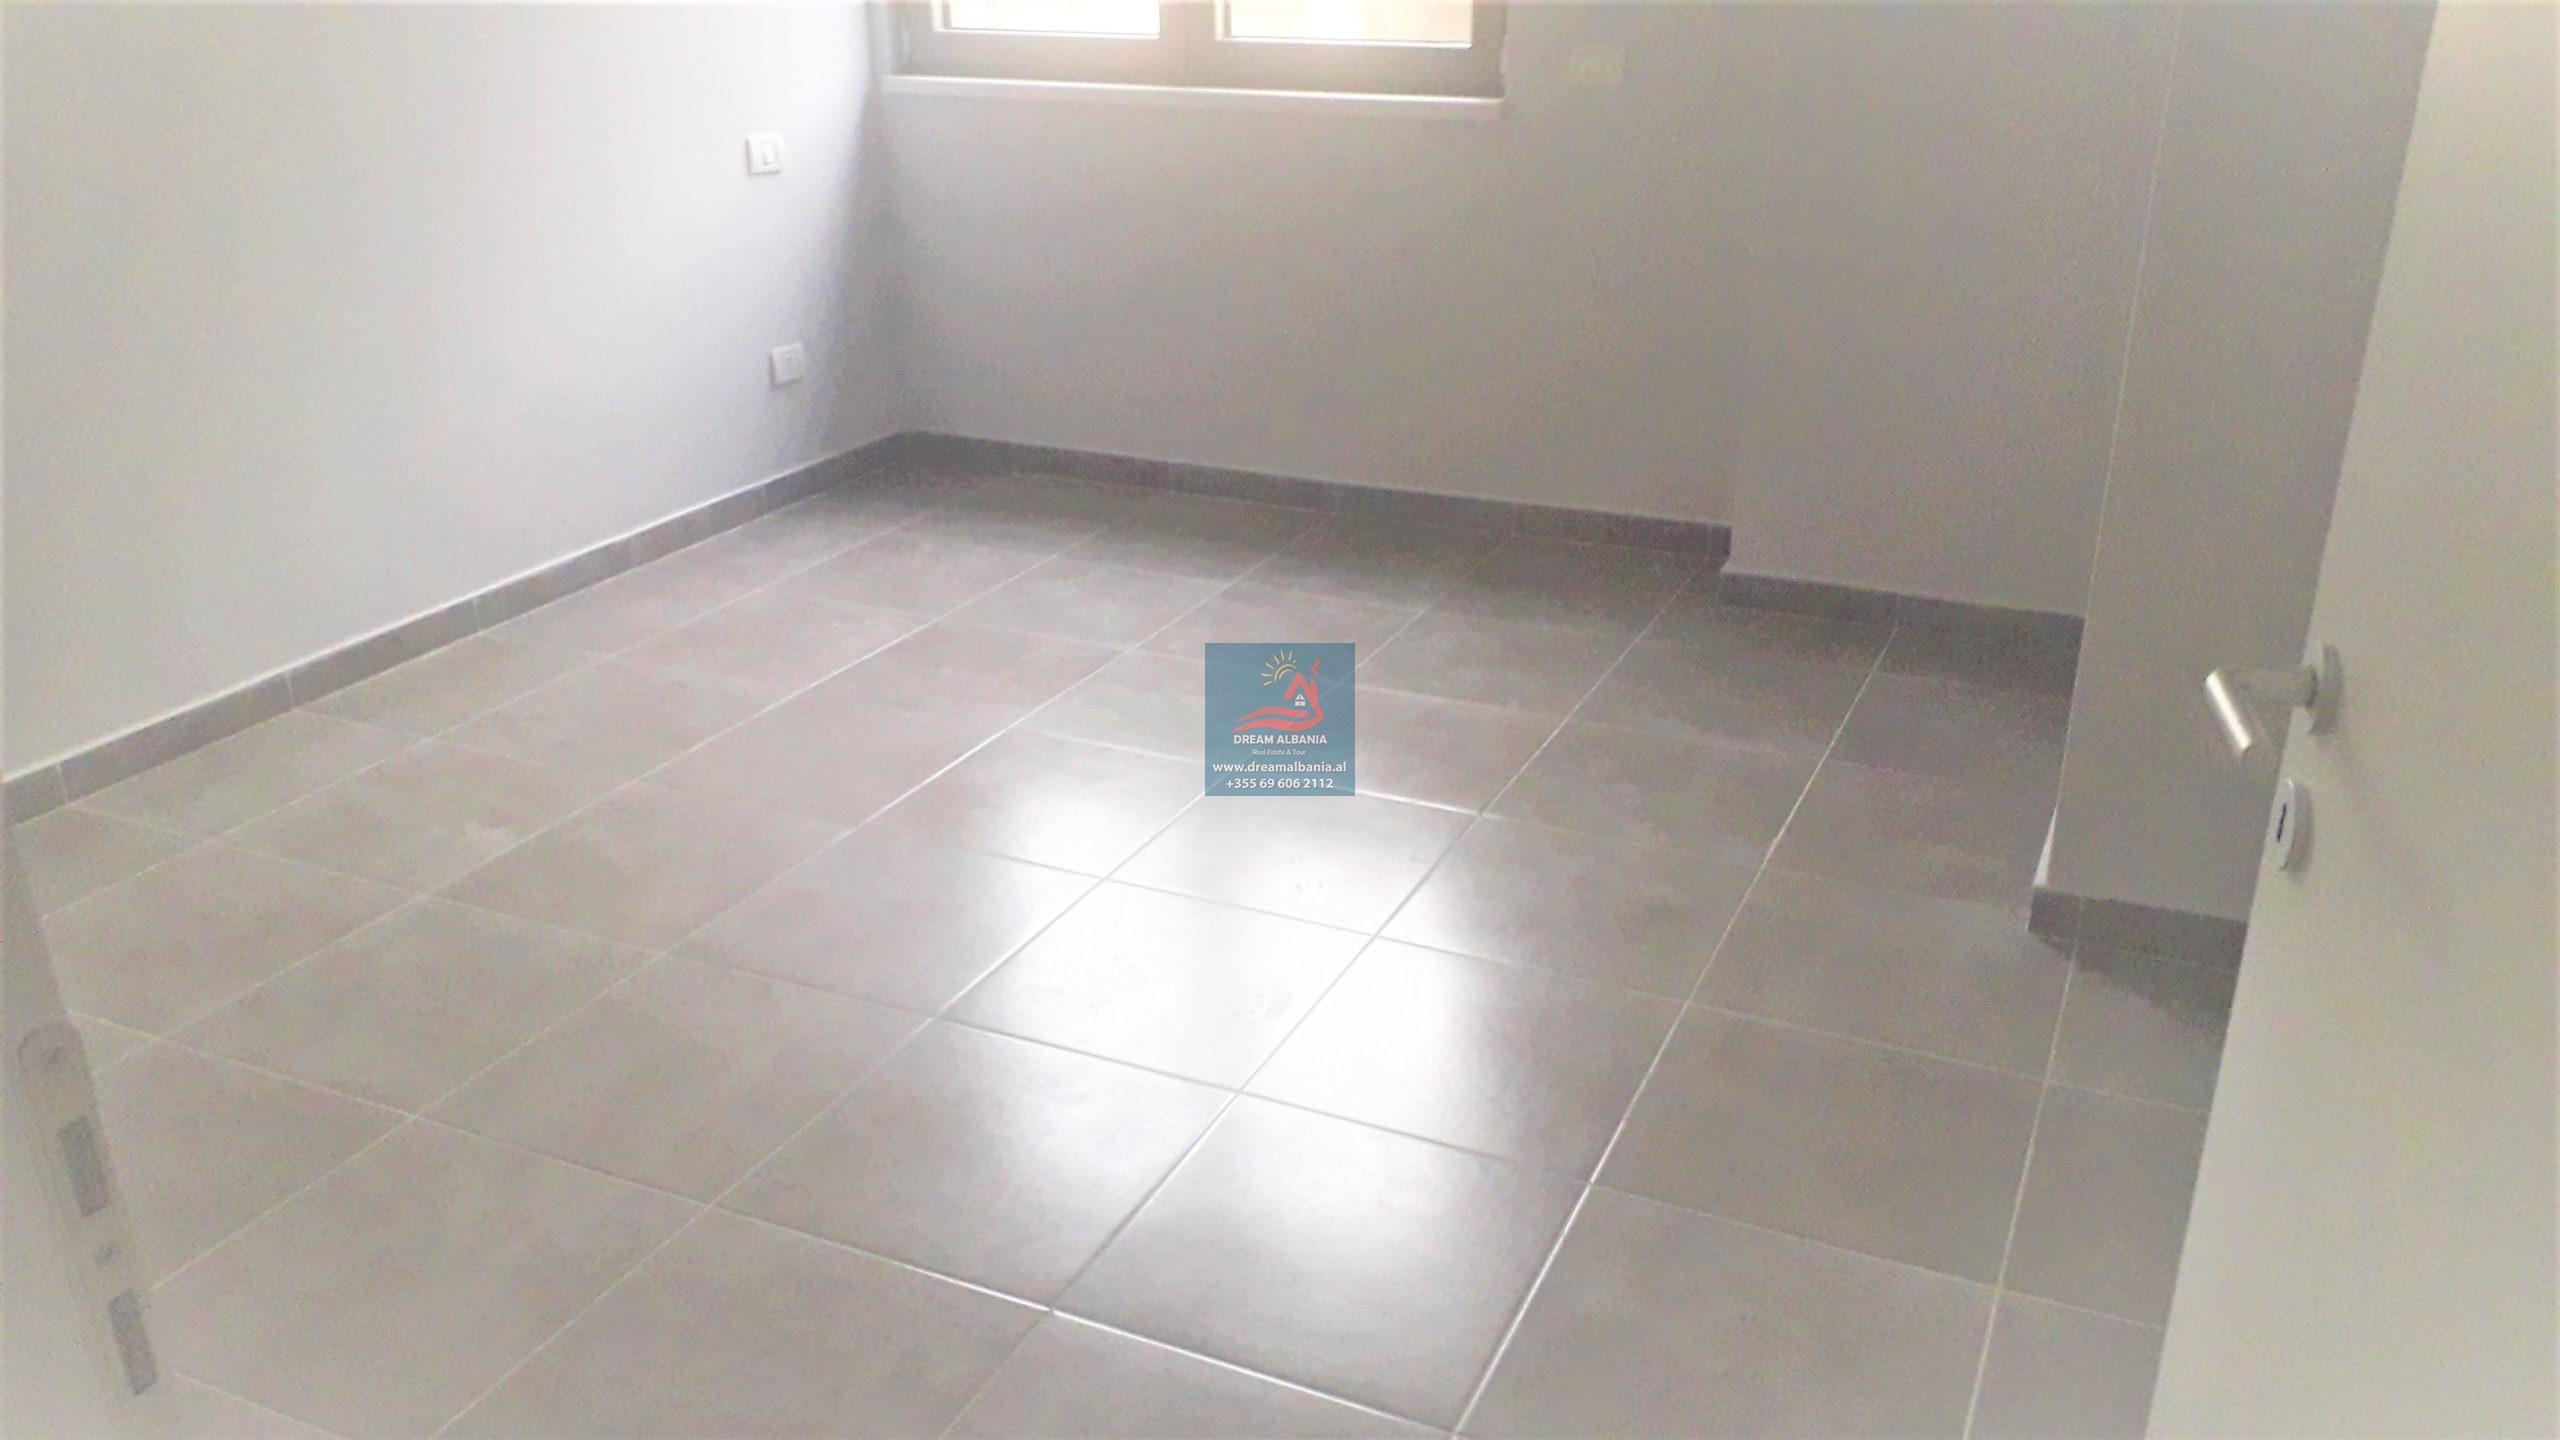 Apartamente 1+1 me qera ne Bllok prane Gardes ne Tirane (ID 4211432 )